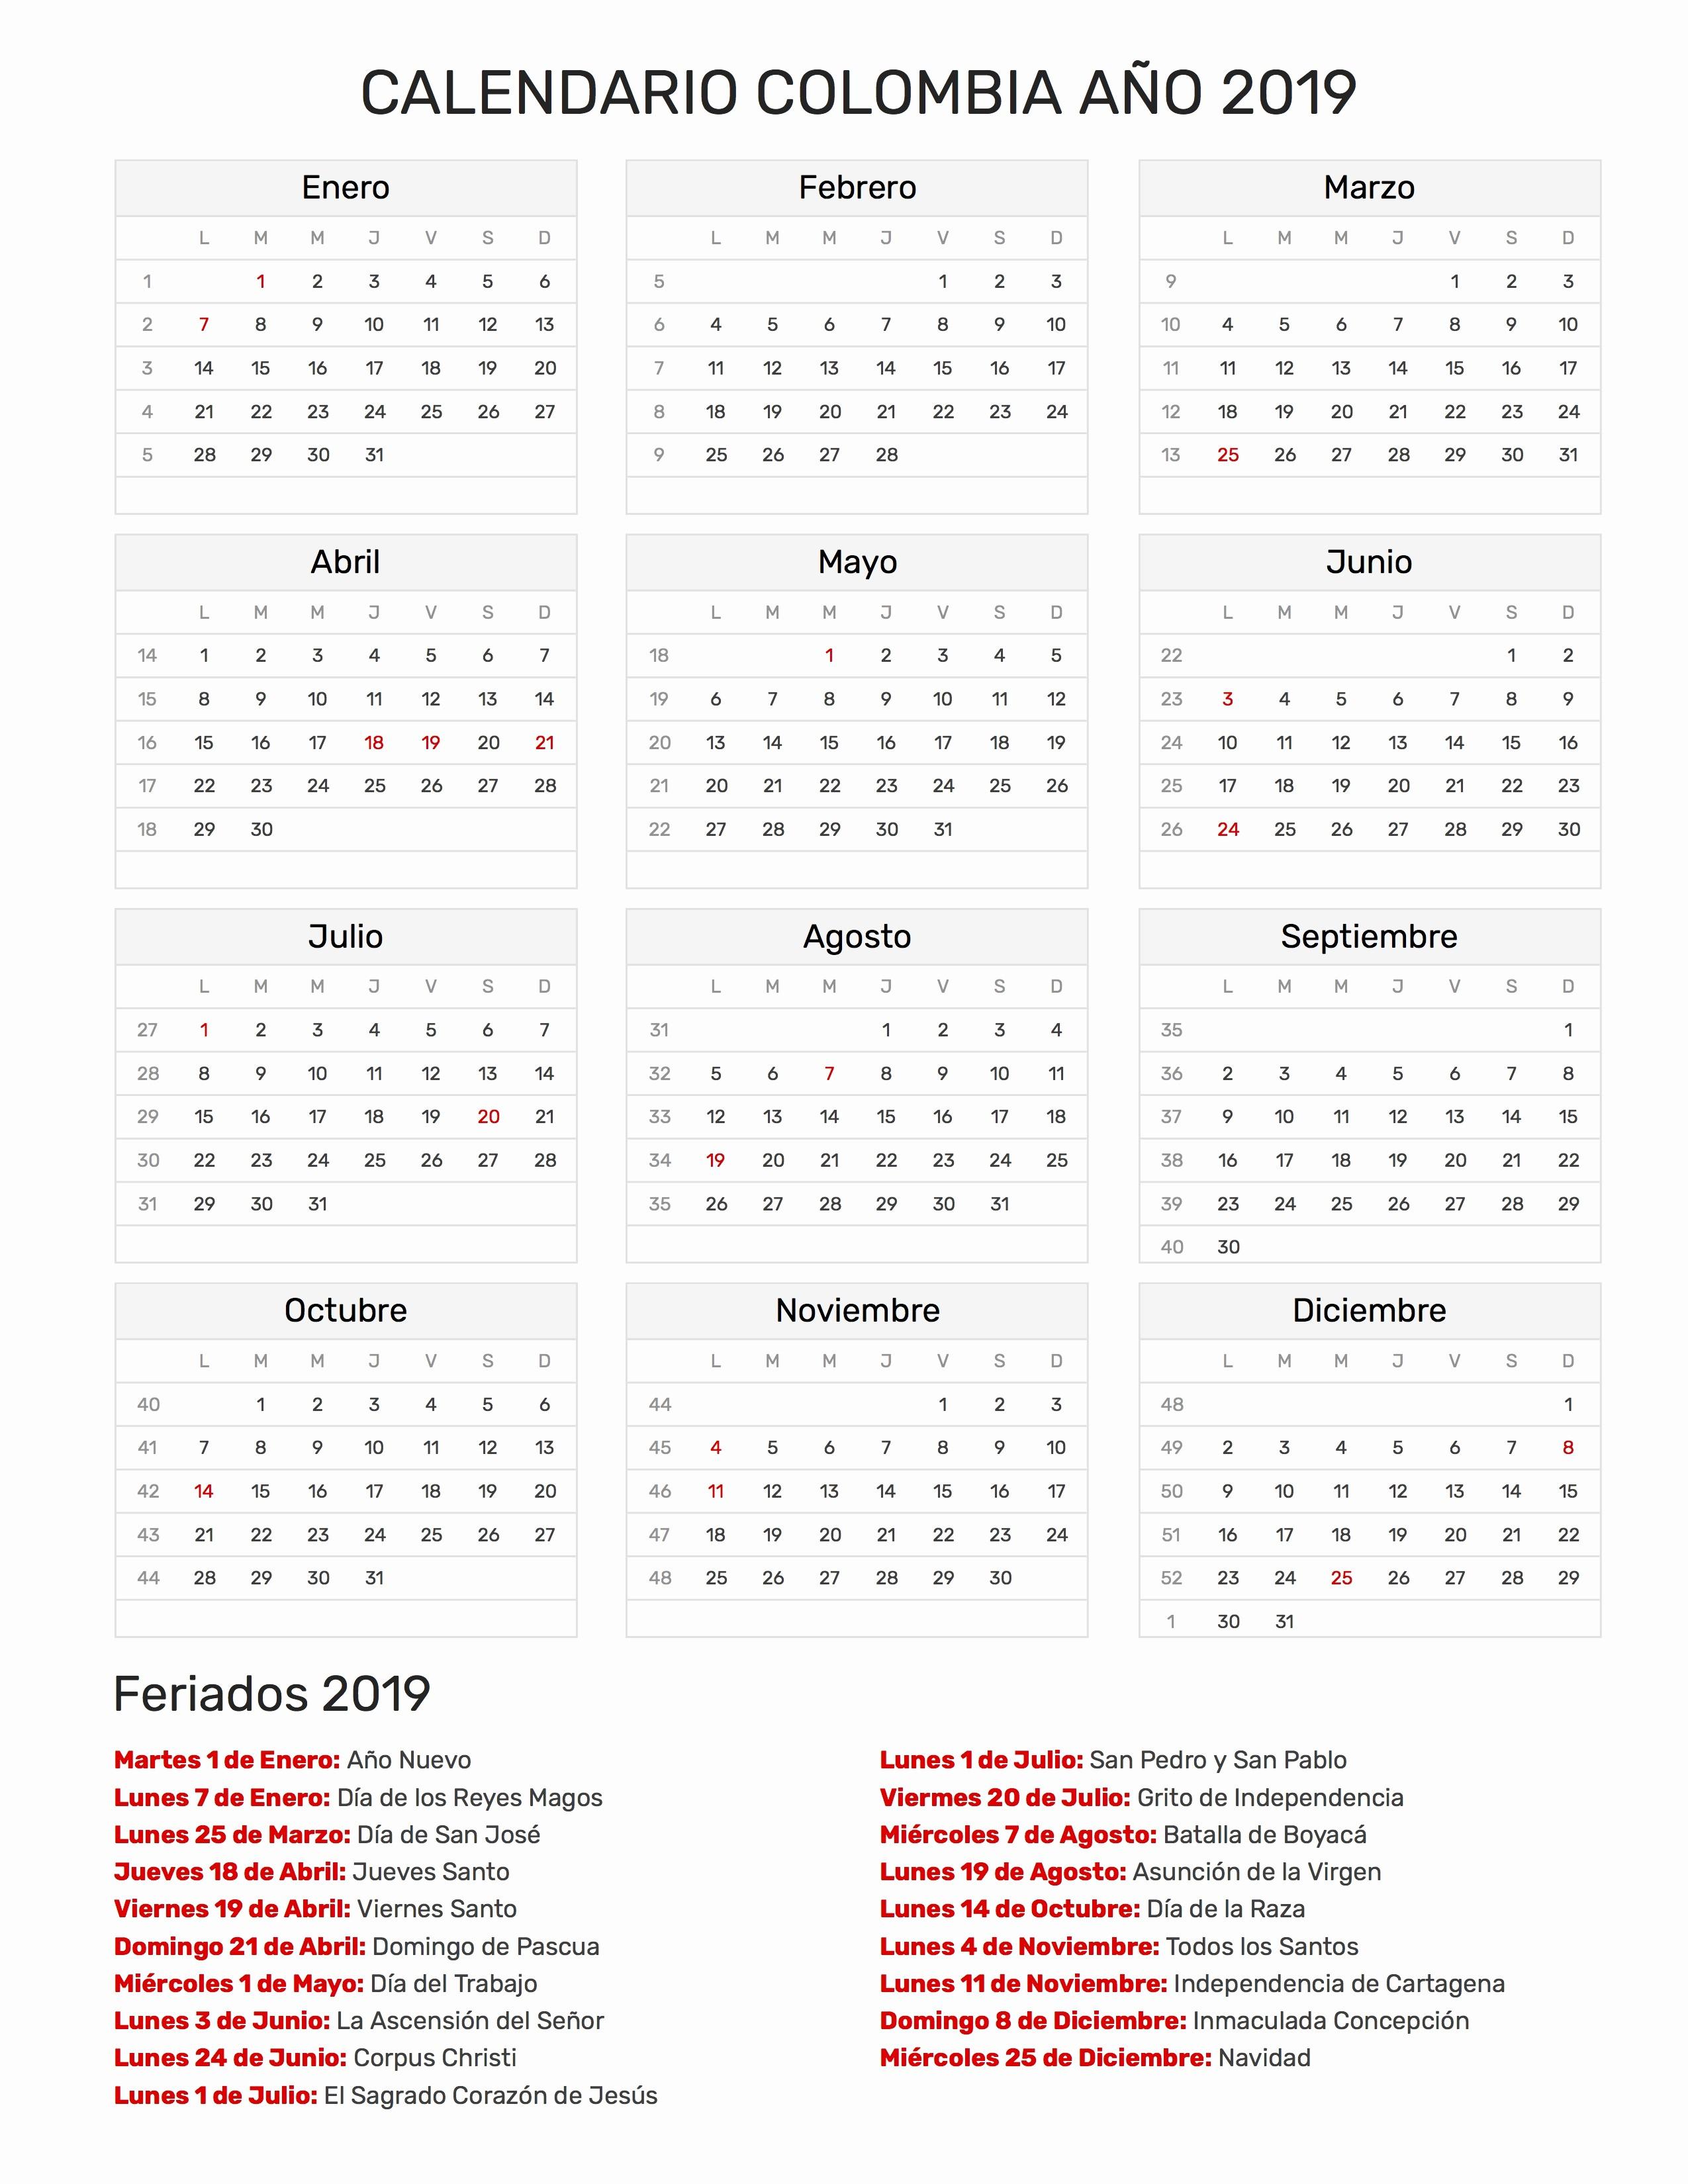 Calendario Febrero 2018 Pdf Más Caliente Calendario Dr 2019 Calendario Colombia Ano 2019 Feriados Of Calendario Febrero 2018 Pdf Más Reciente eventos